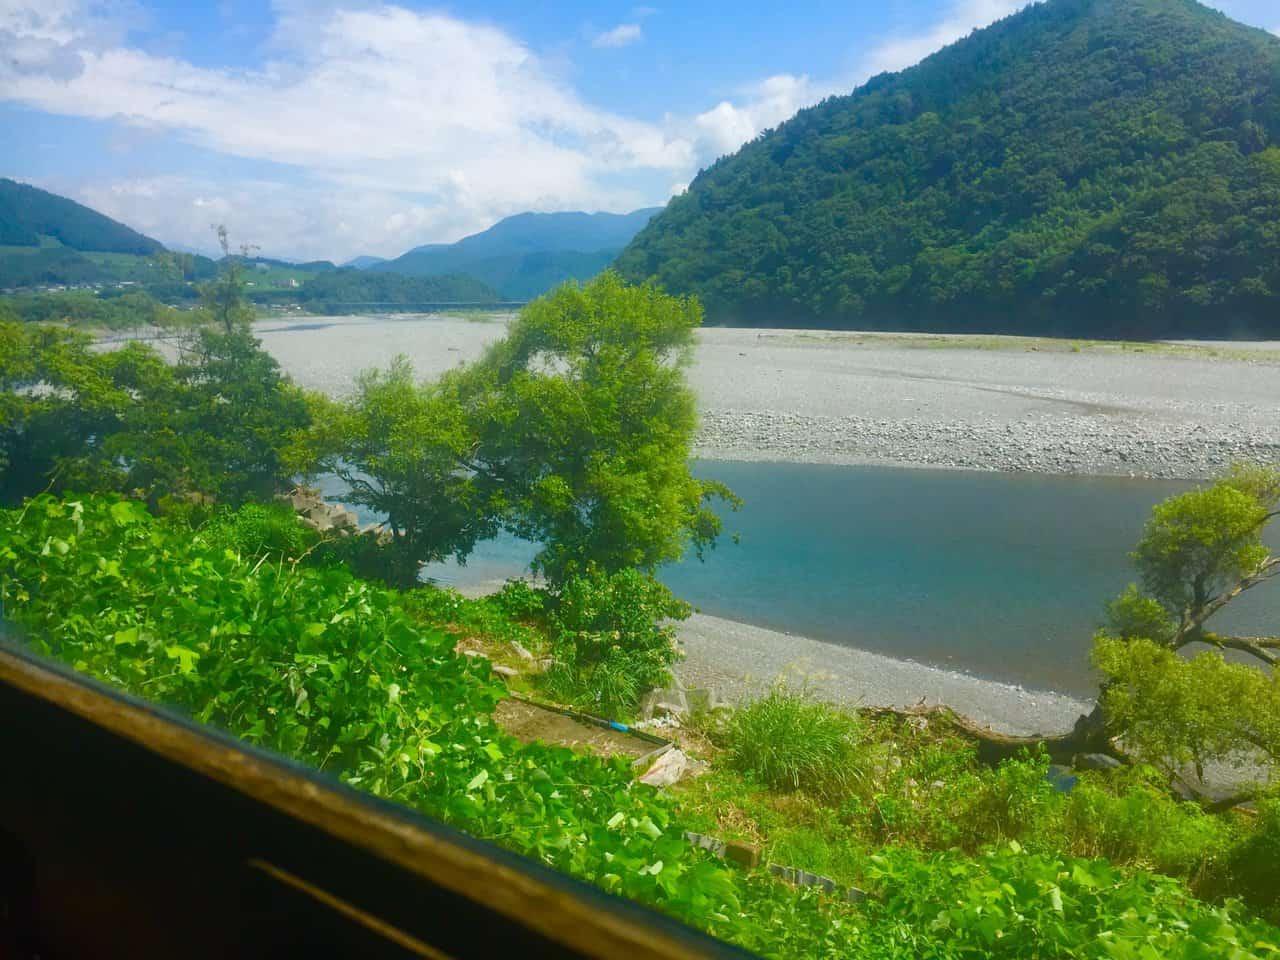 Shizuoka Oigawa Railway, train rides offer marvelous views of Japan